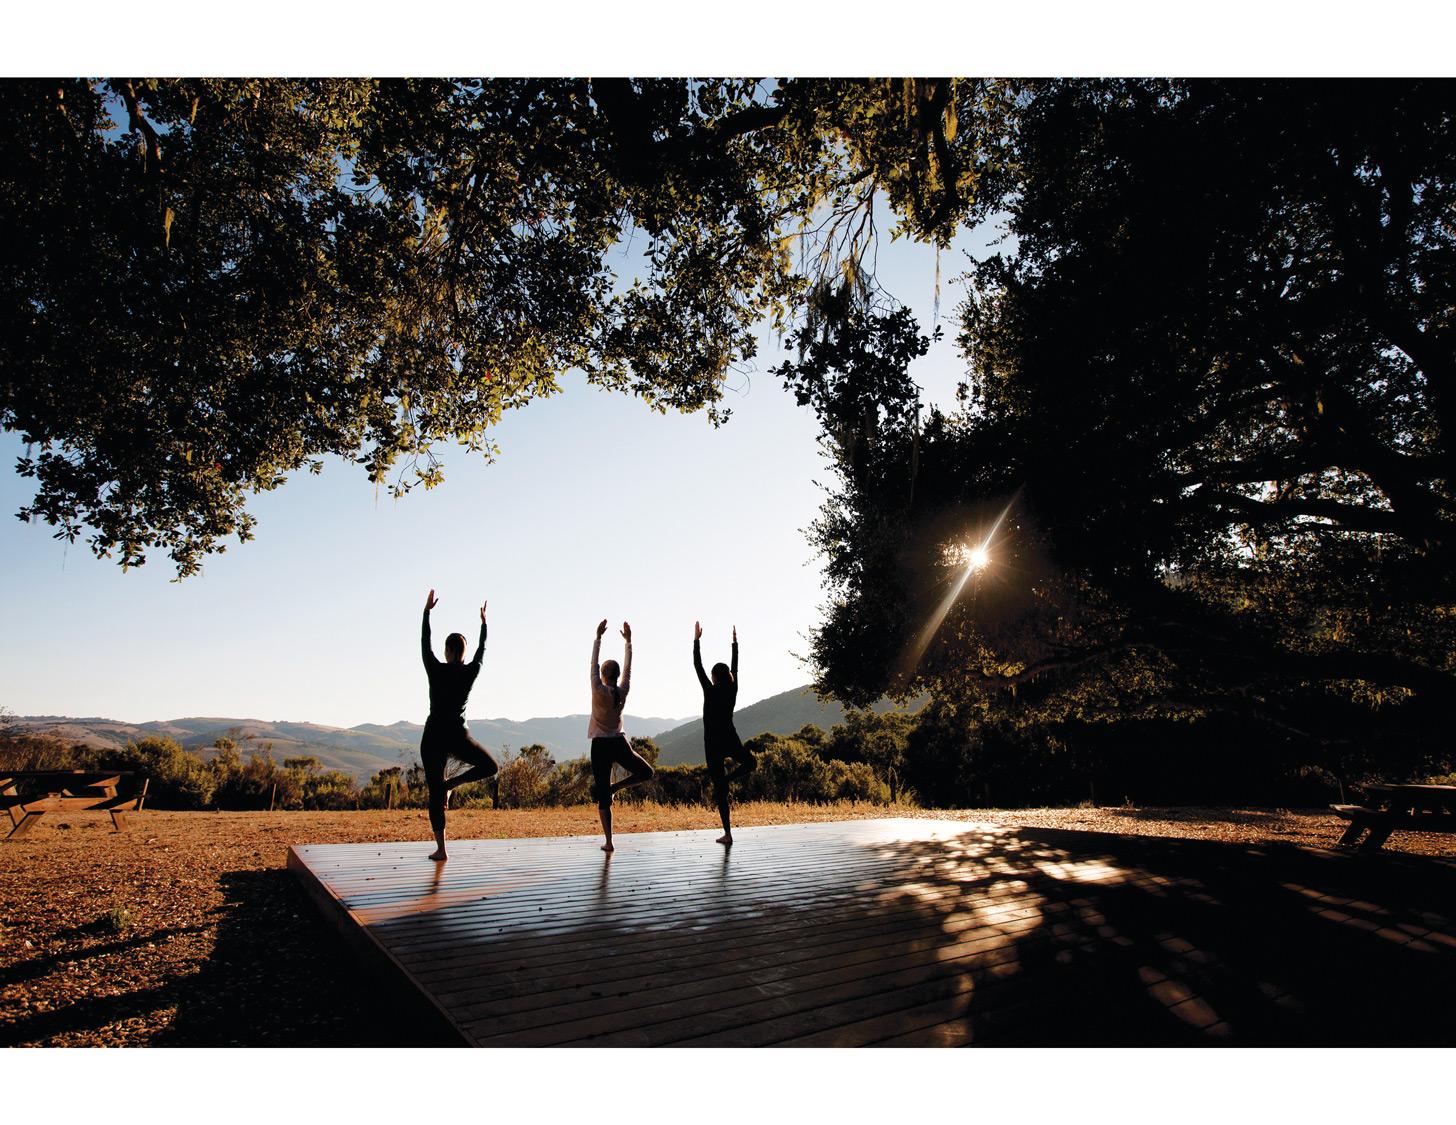 Hilltop Yoga at Carmel Valley Ranch in California.